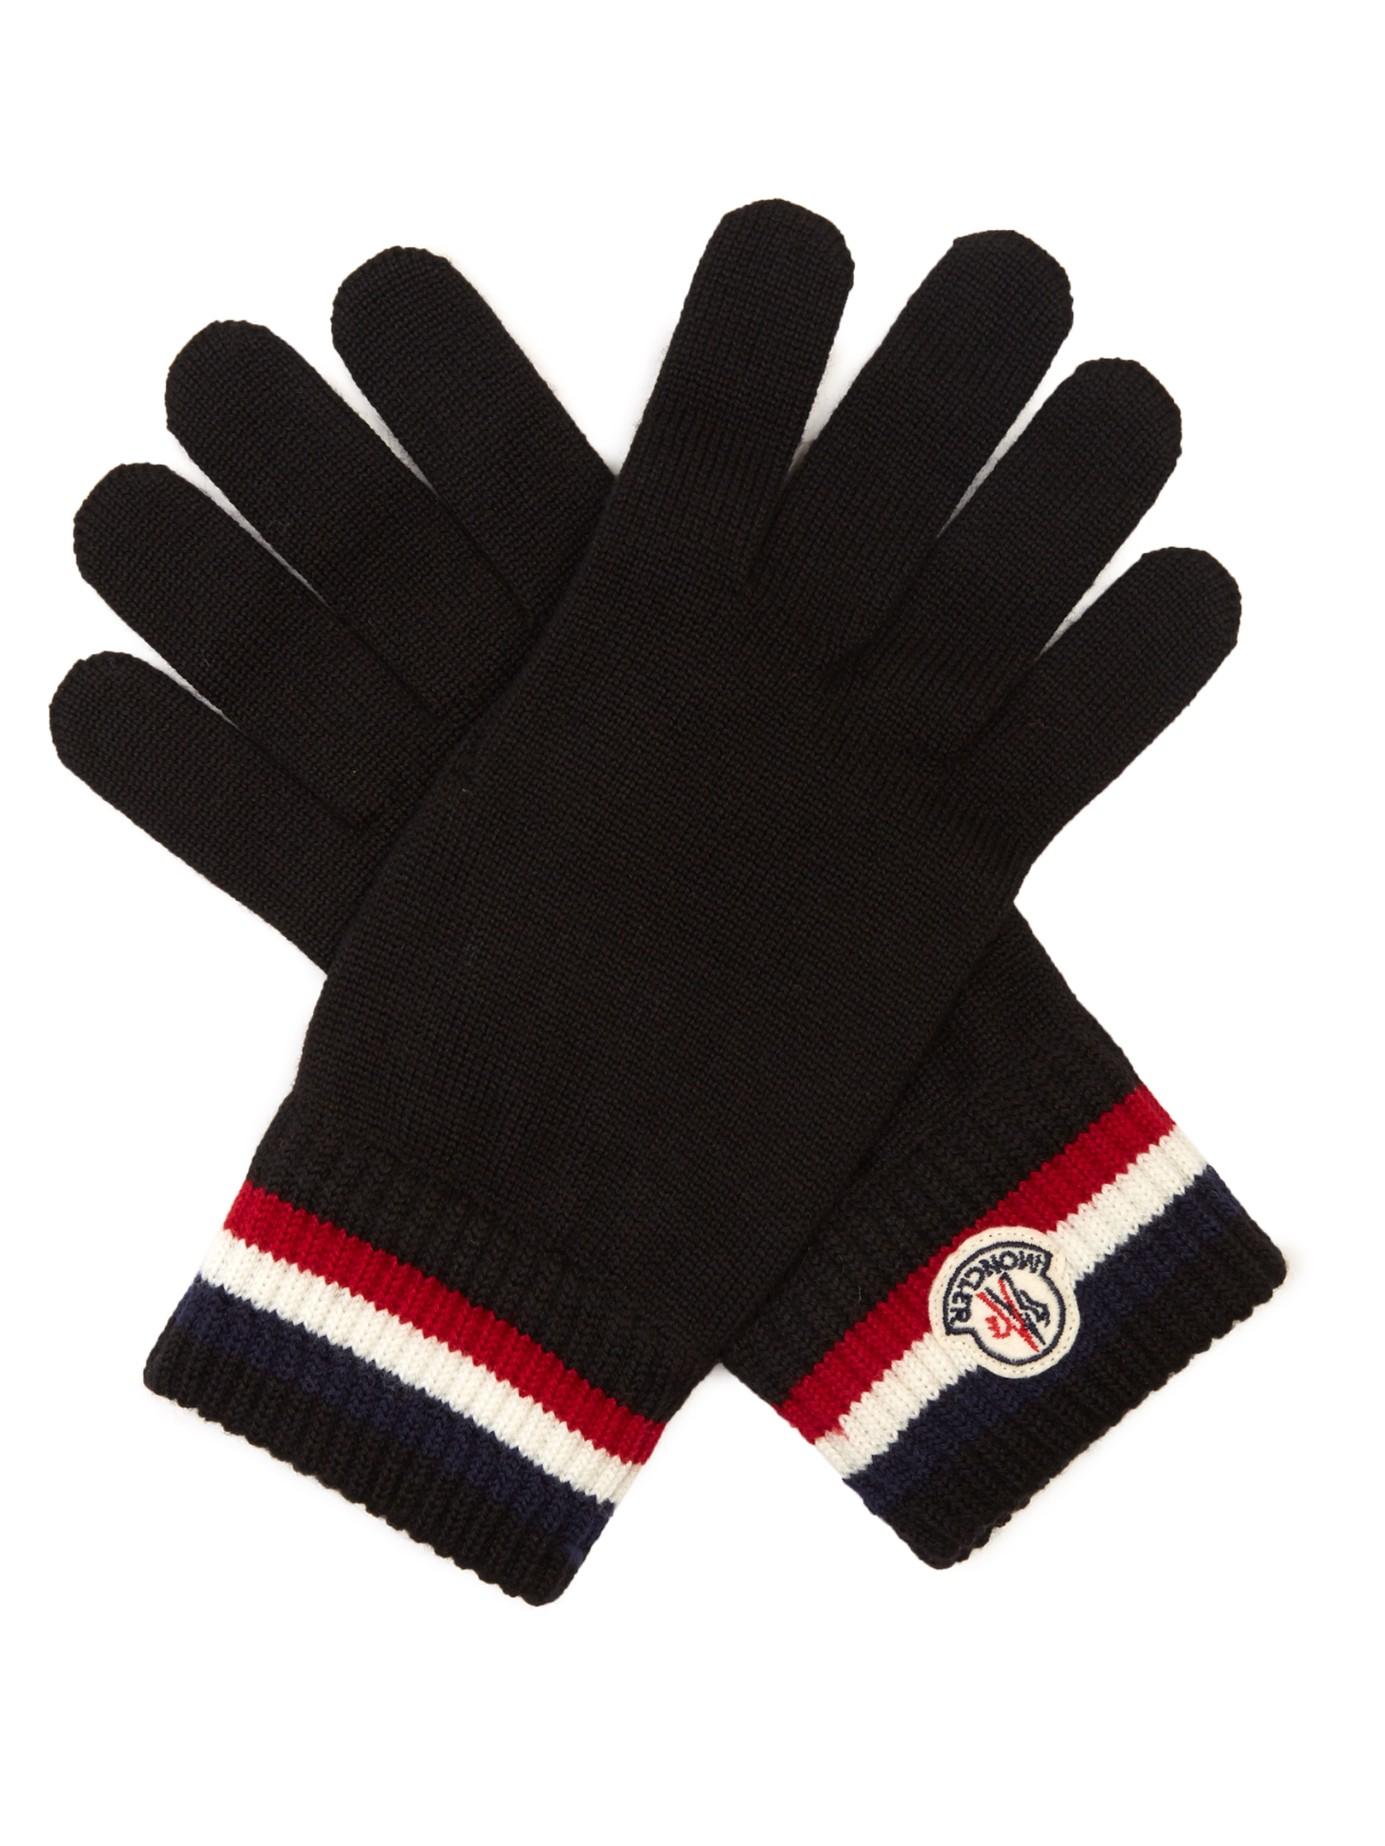 moncler womens gloves